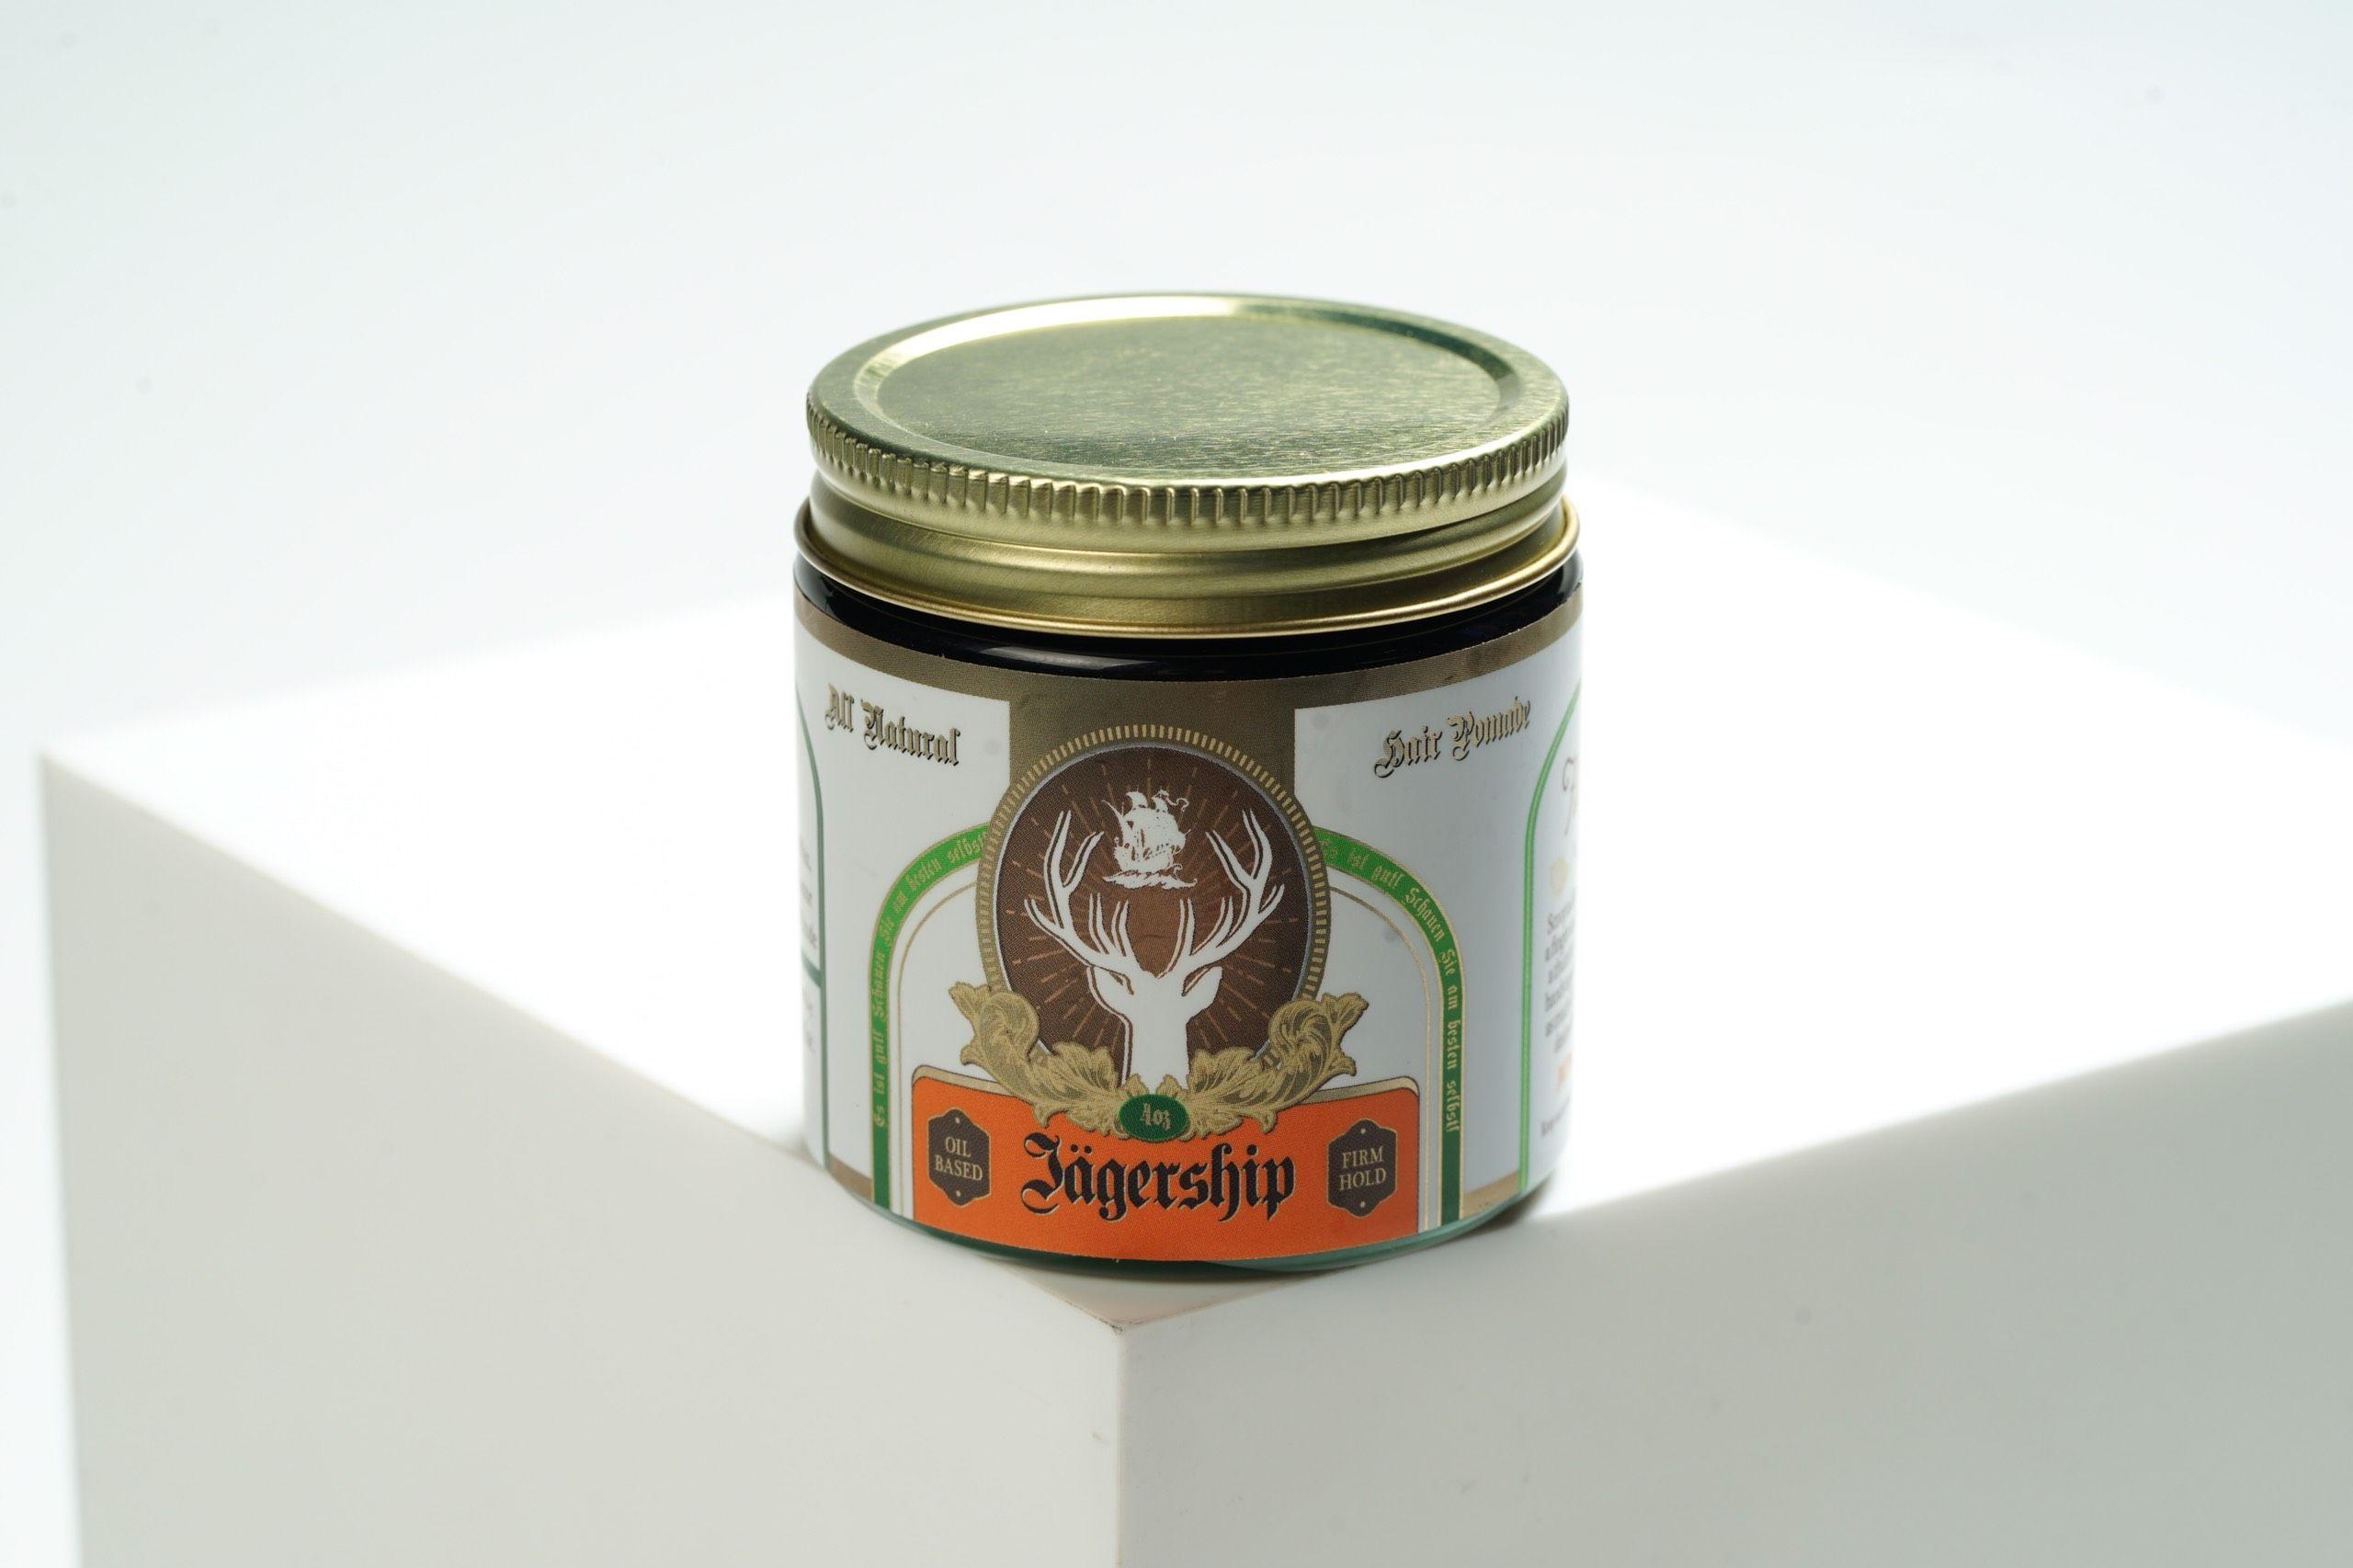 Jagership Oil Based